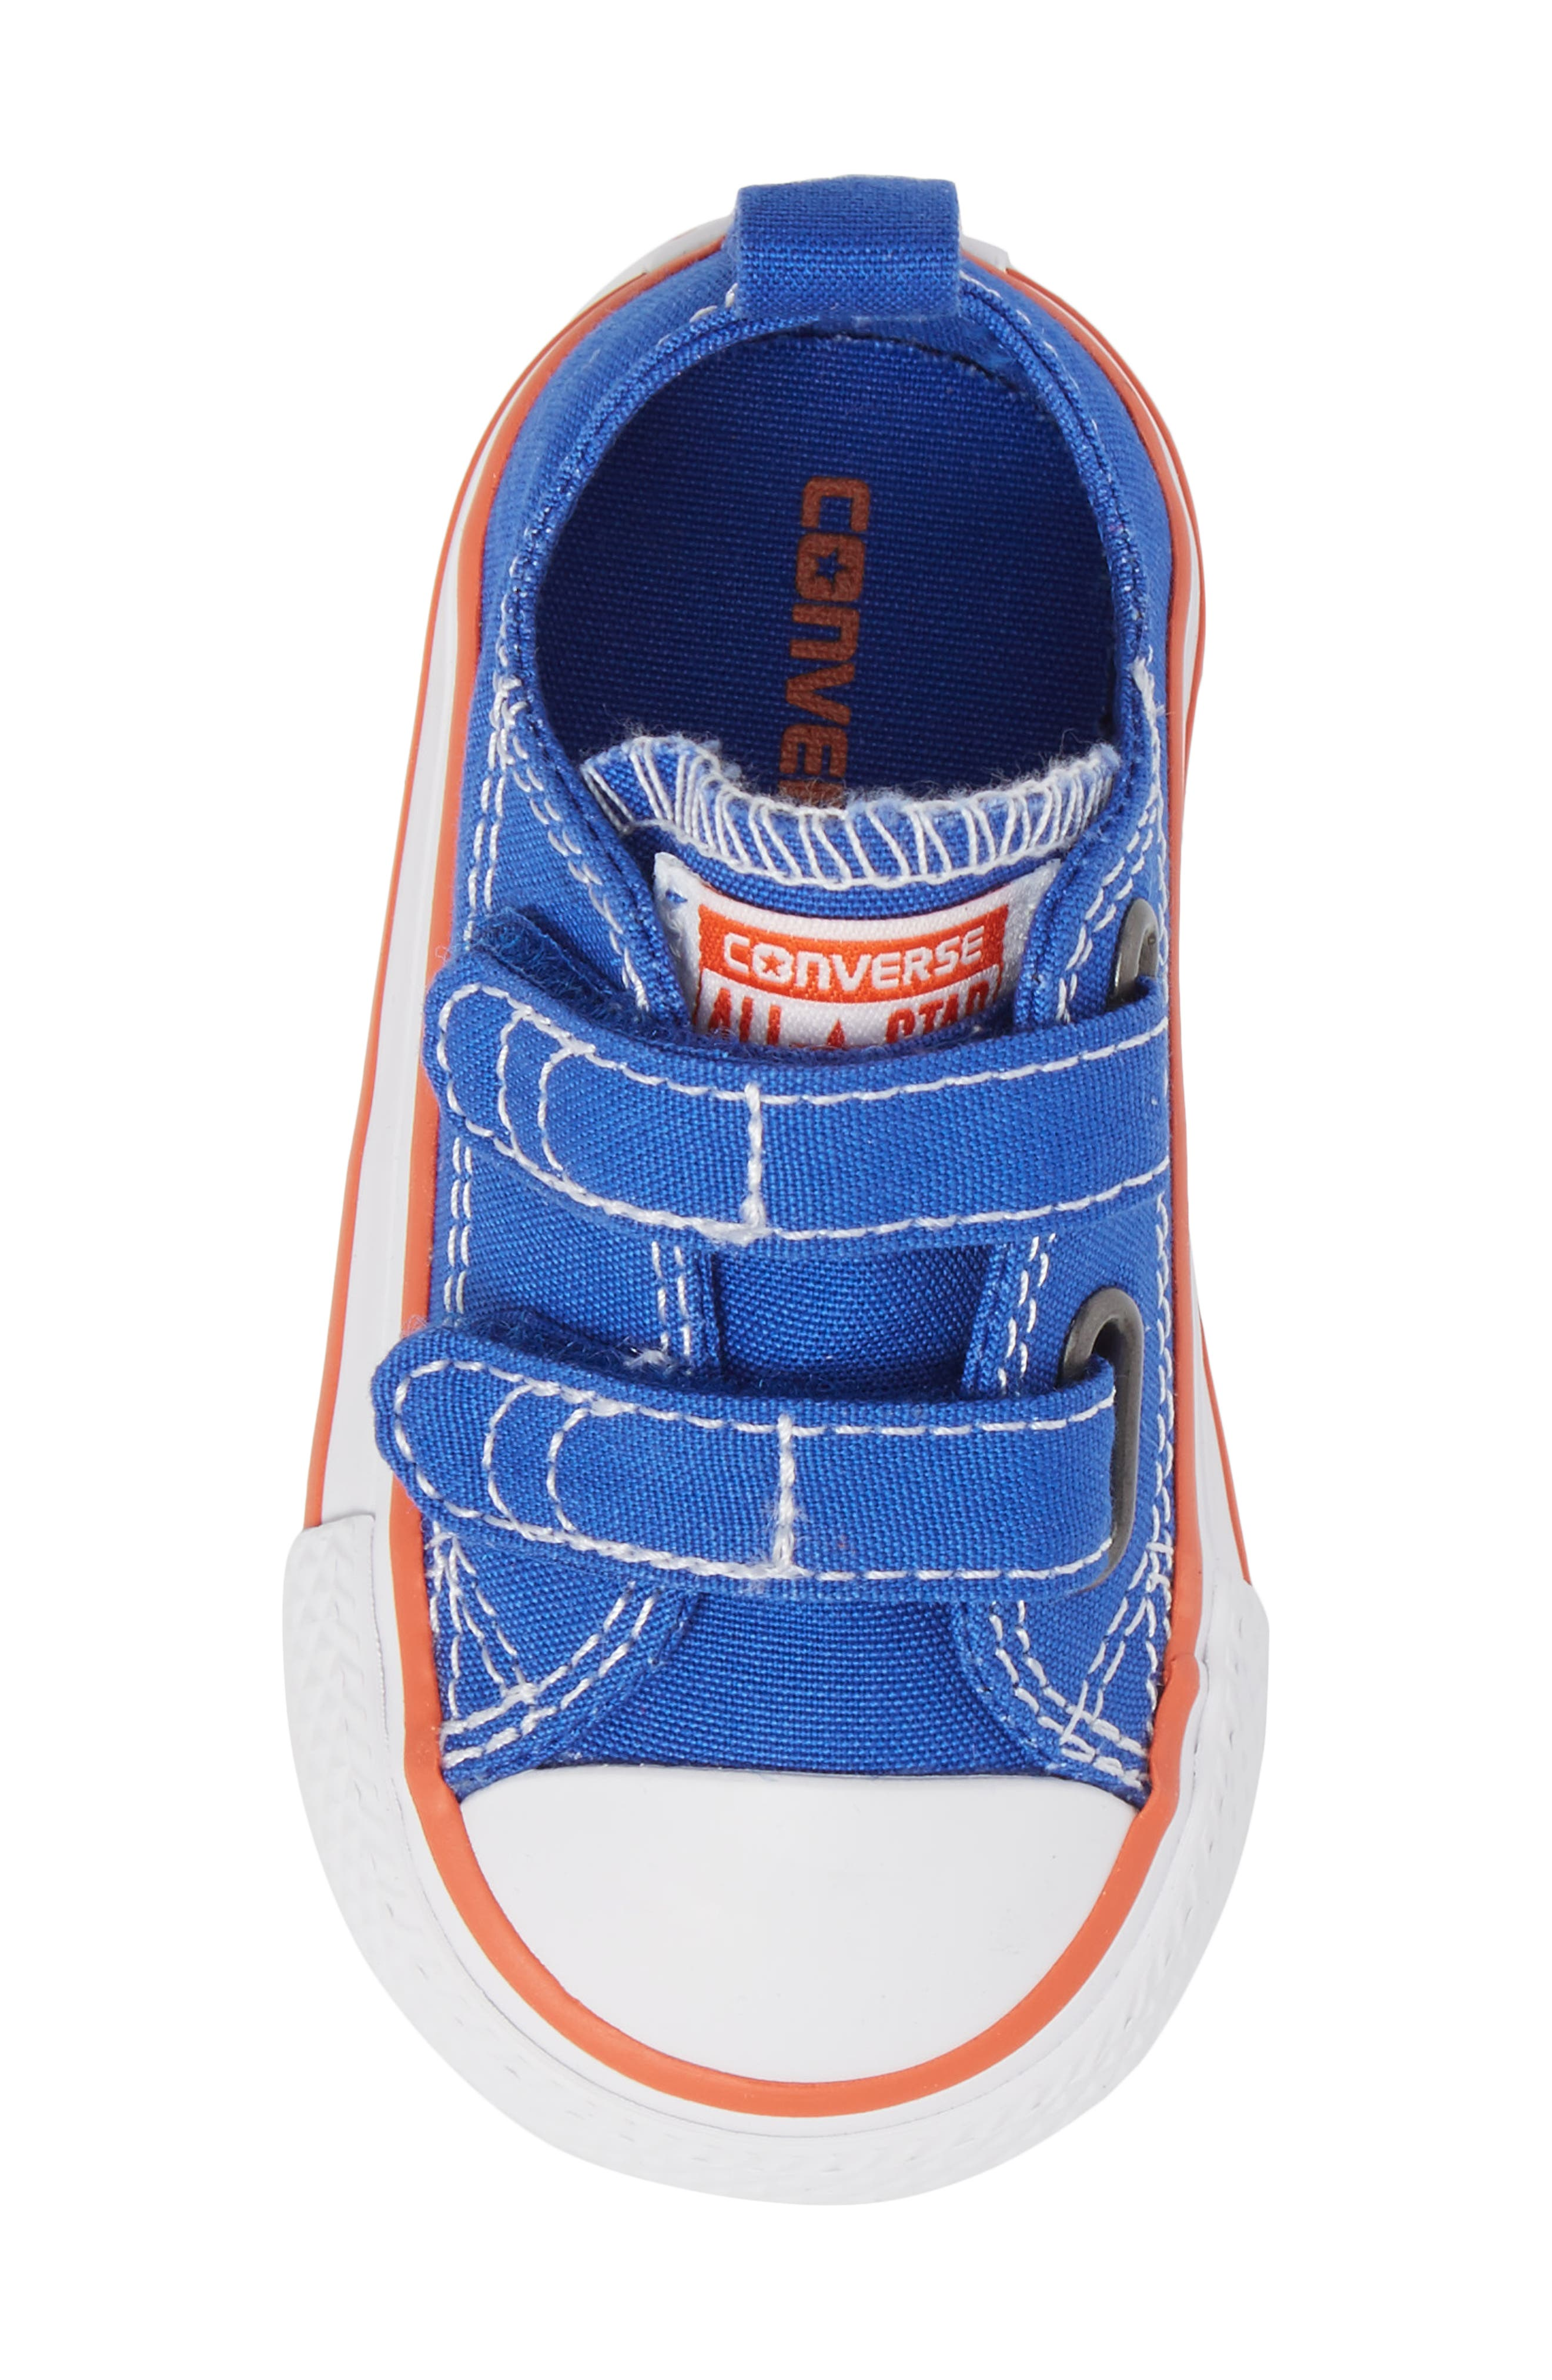 Chuck Taylor<sup>®</sup> All Star<sup>®</sup> Seasonal 2V Low Top Sneaker,                             Alternate thumbnail 5, color,                             483